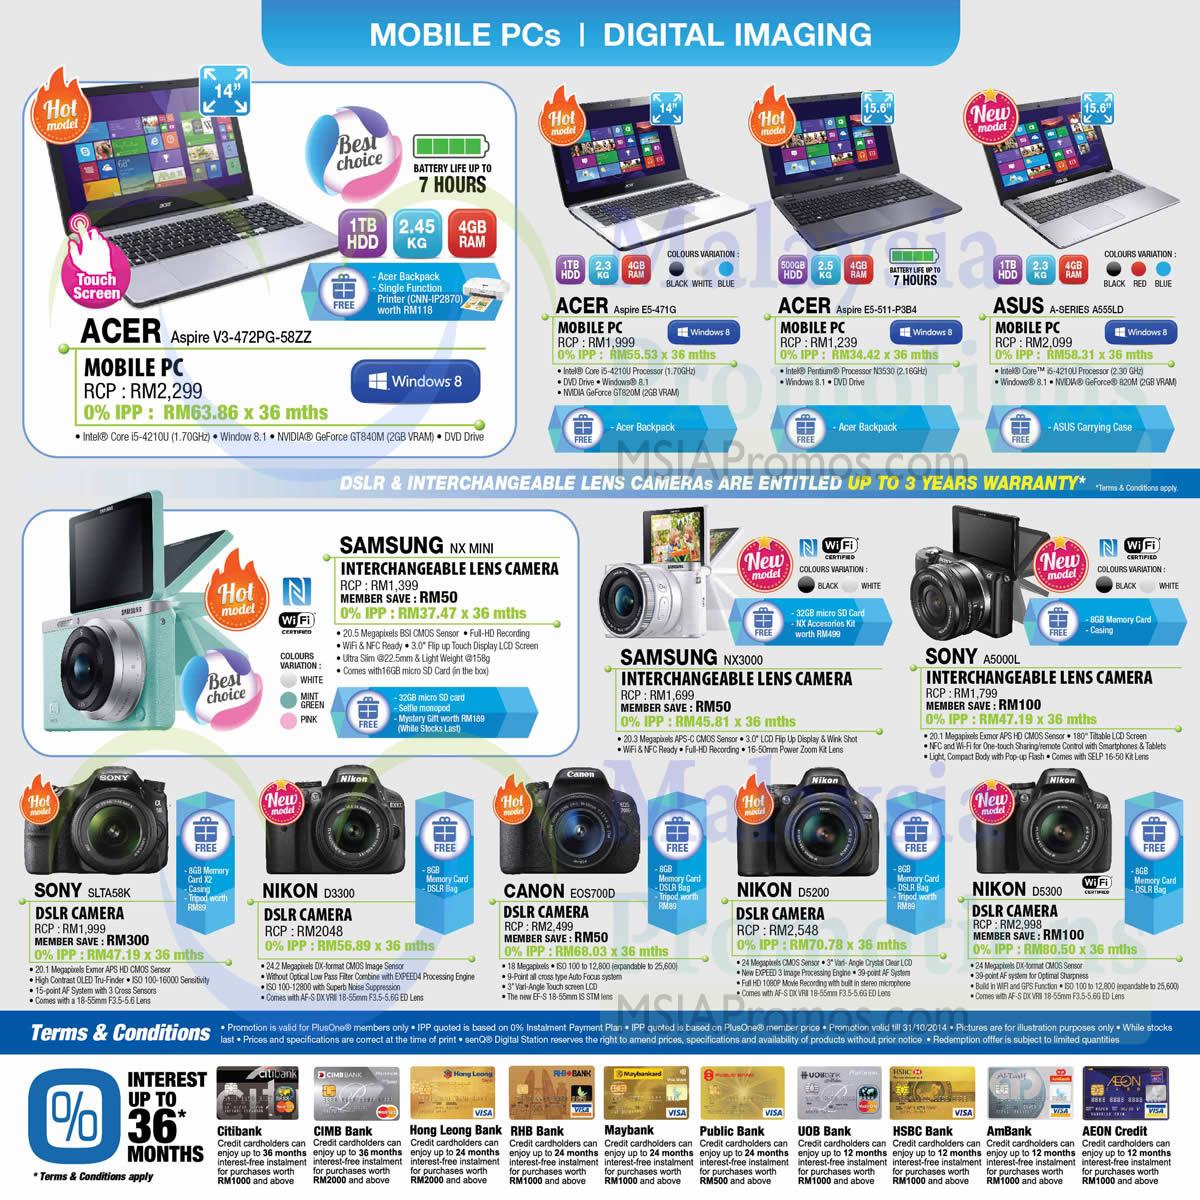 Notebook samsung format - Notebooks Digital Cameras Sony Samsung Acer Asus Nikon Canon